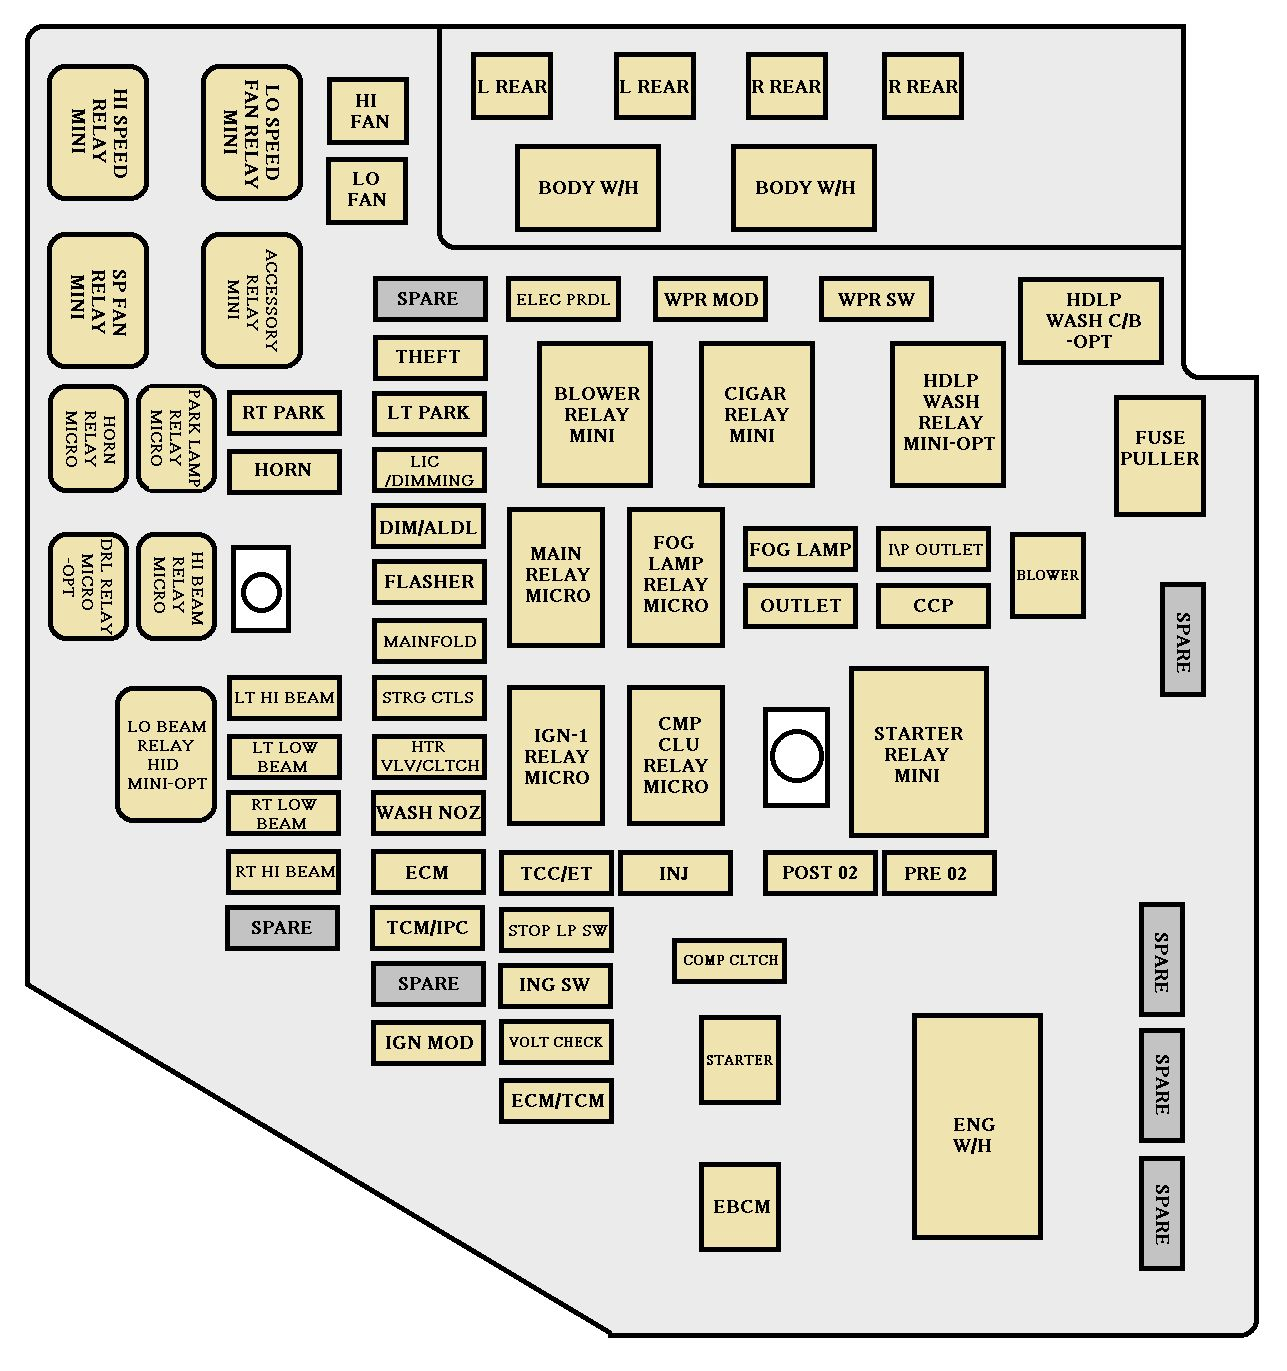 2000 Cadillac Escalade Fuse Box Location Schematics Diagram 2010 Cts 2003 Trusted Wiring Jetta Cigarette Lighter